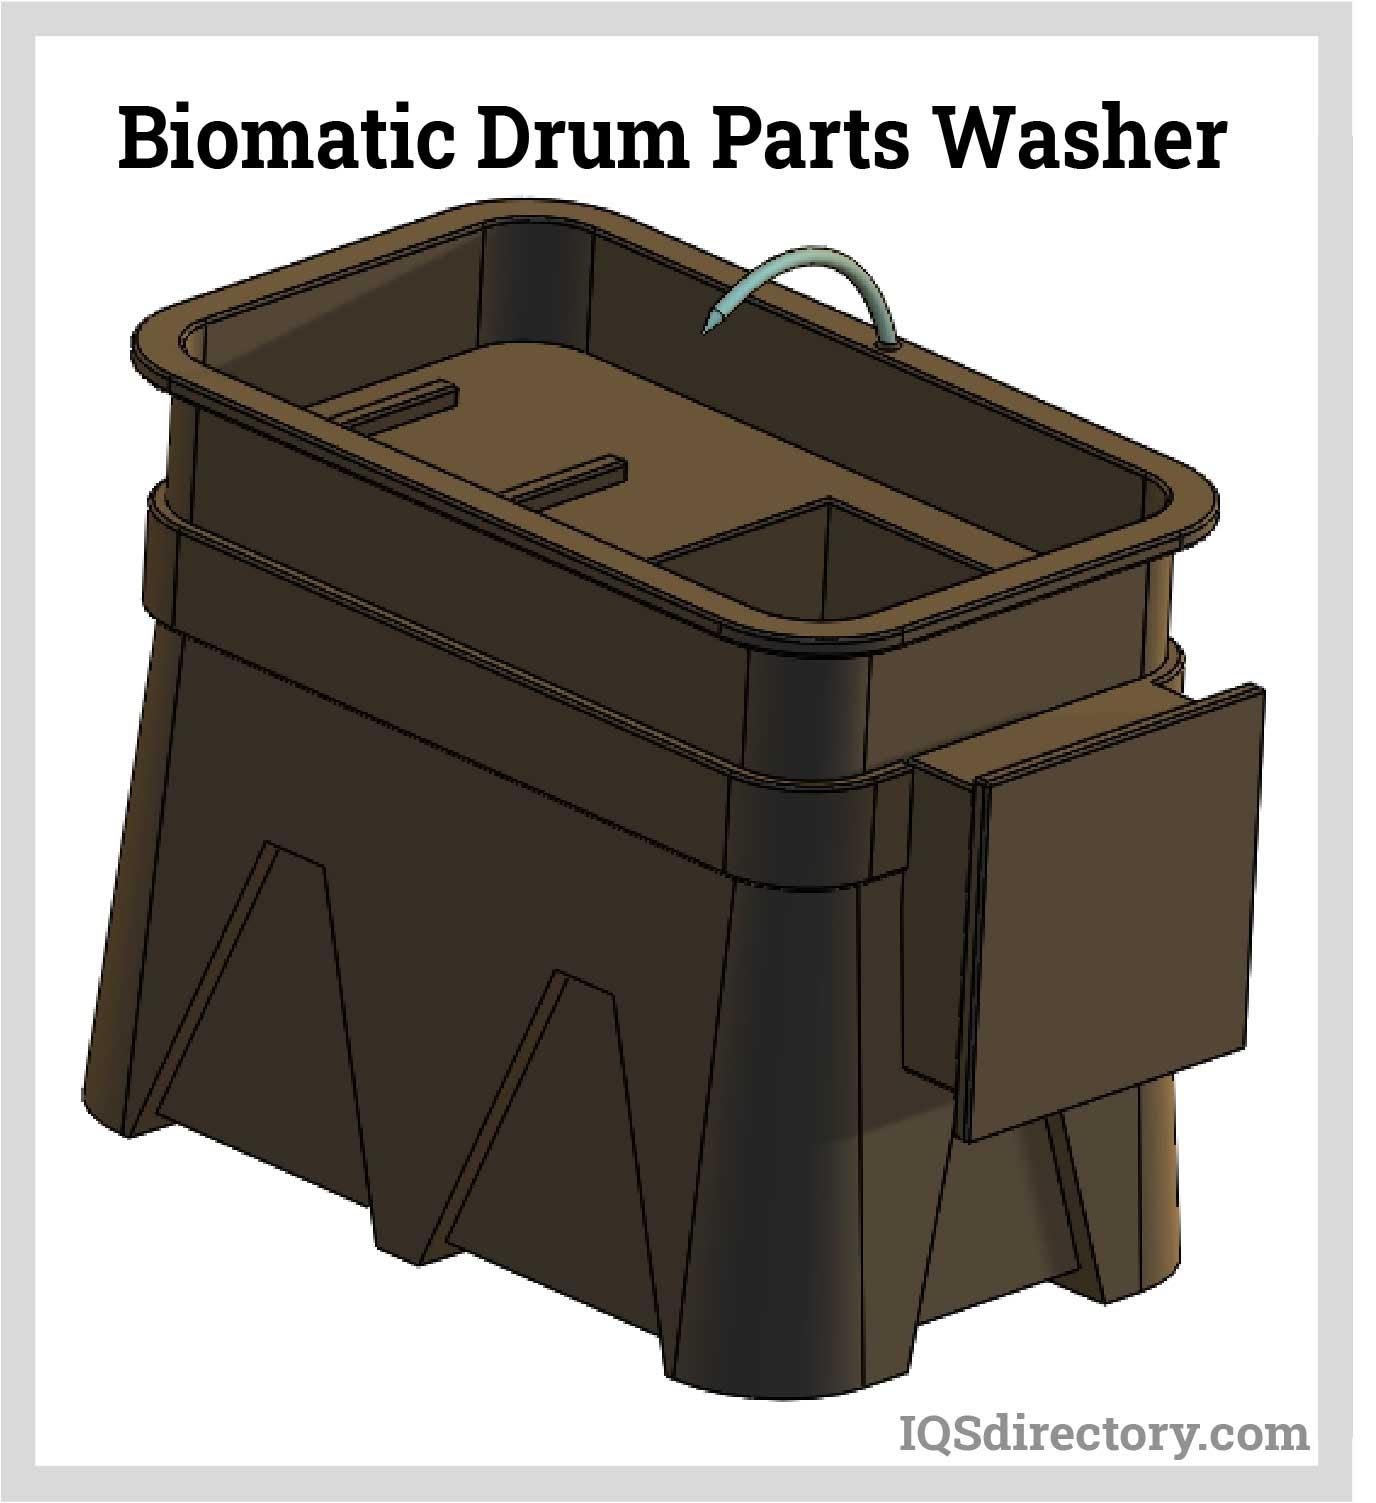 Biomatic Drum Parts Washer